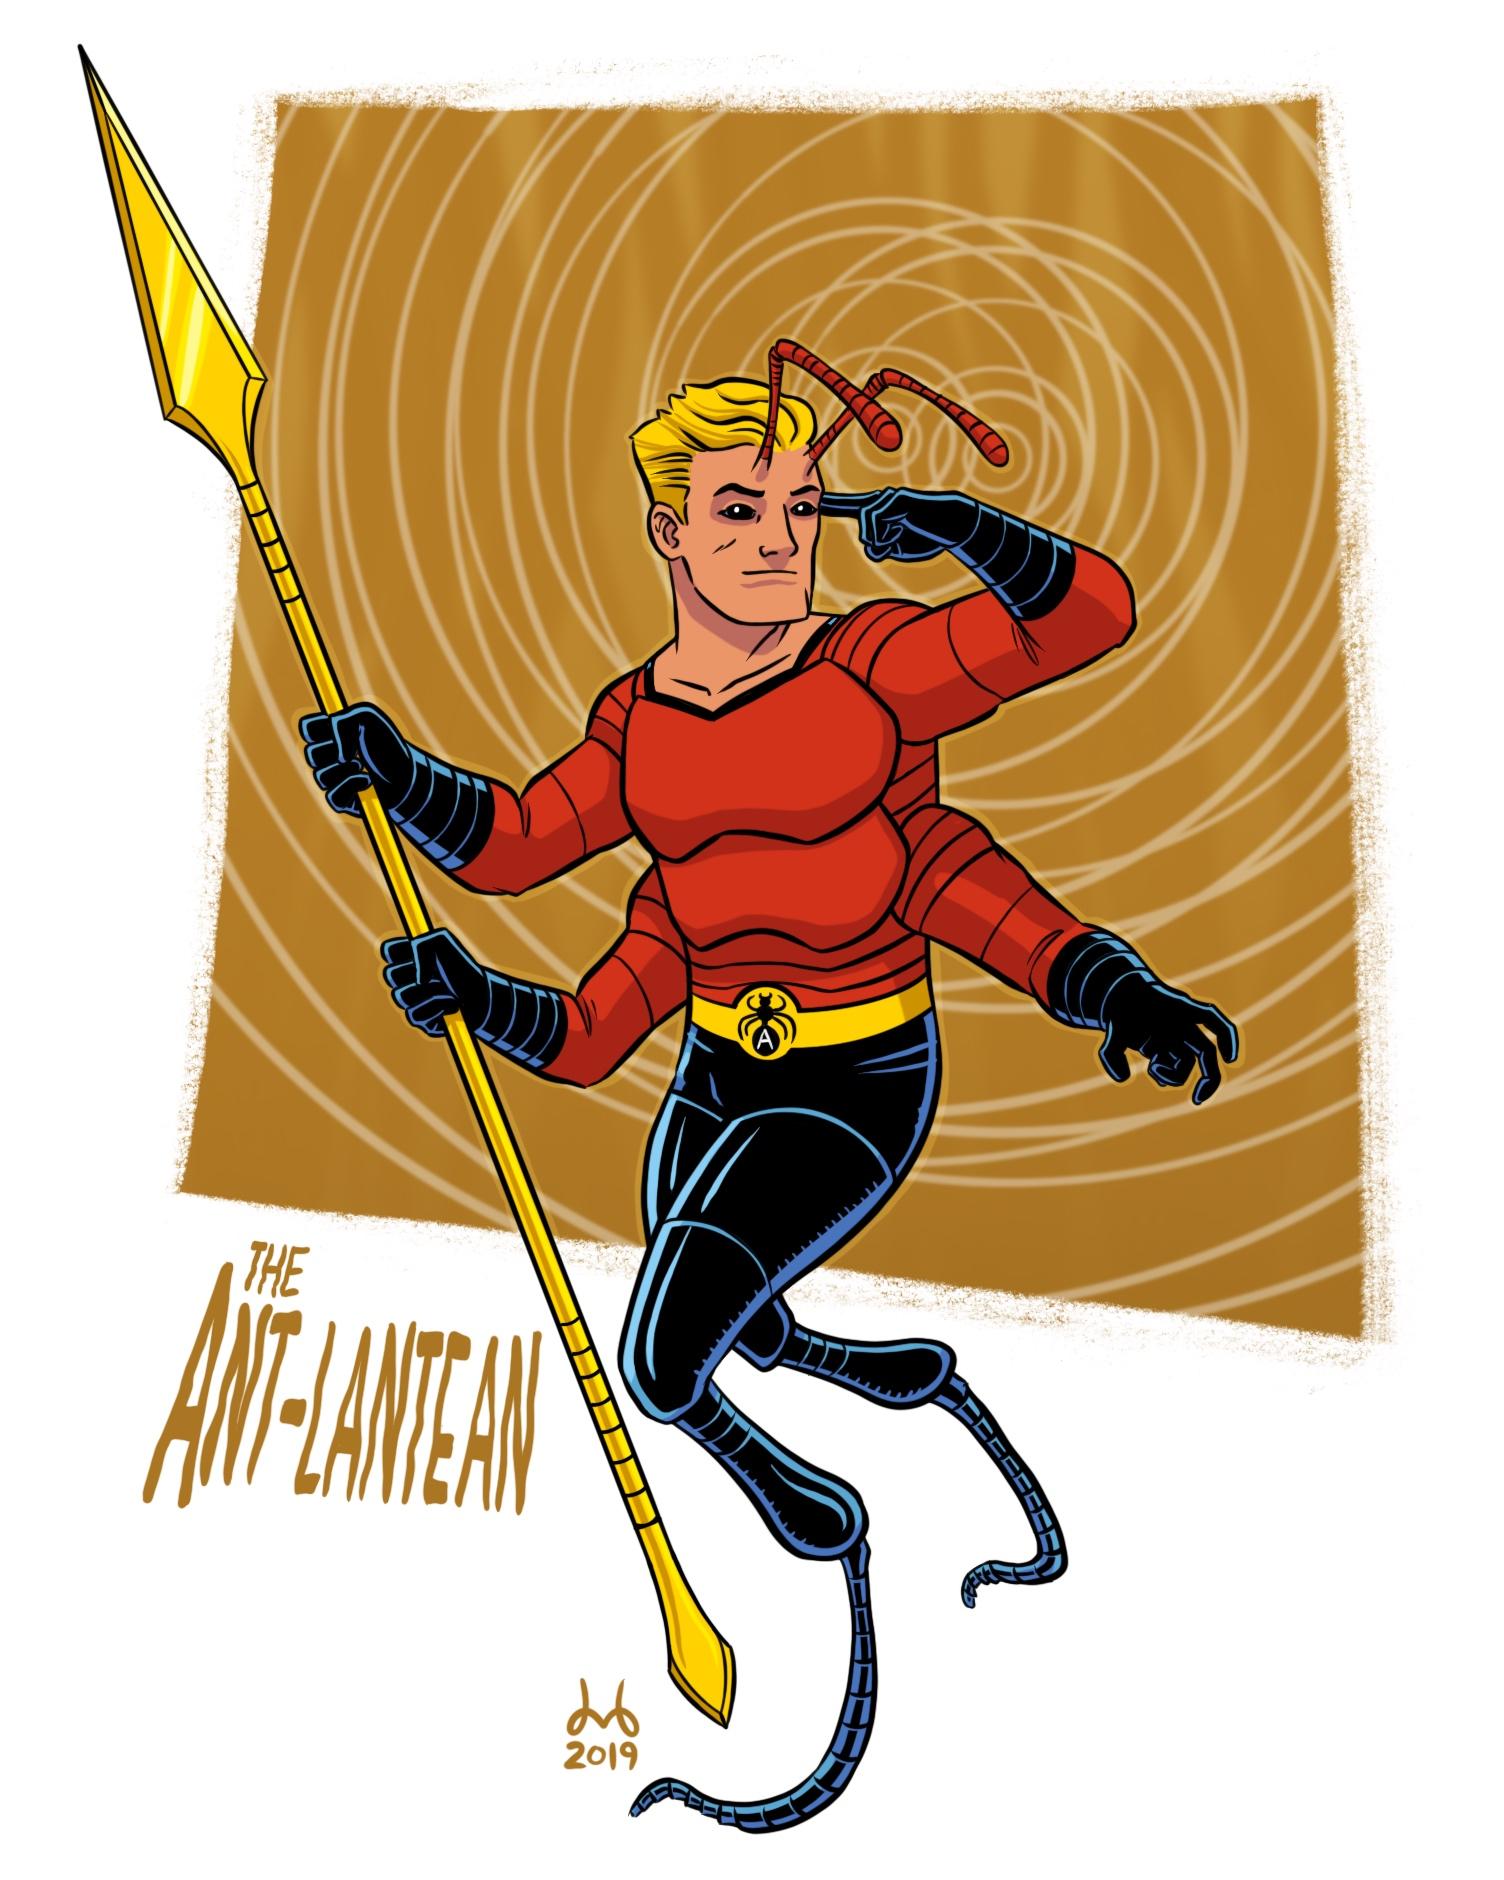 The Ant-Lantean